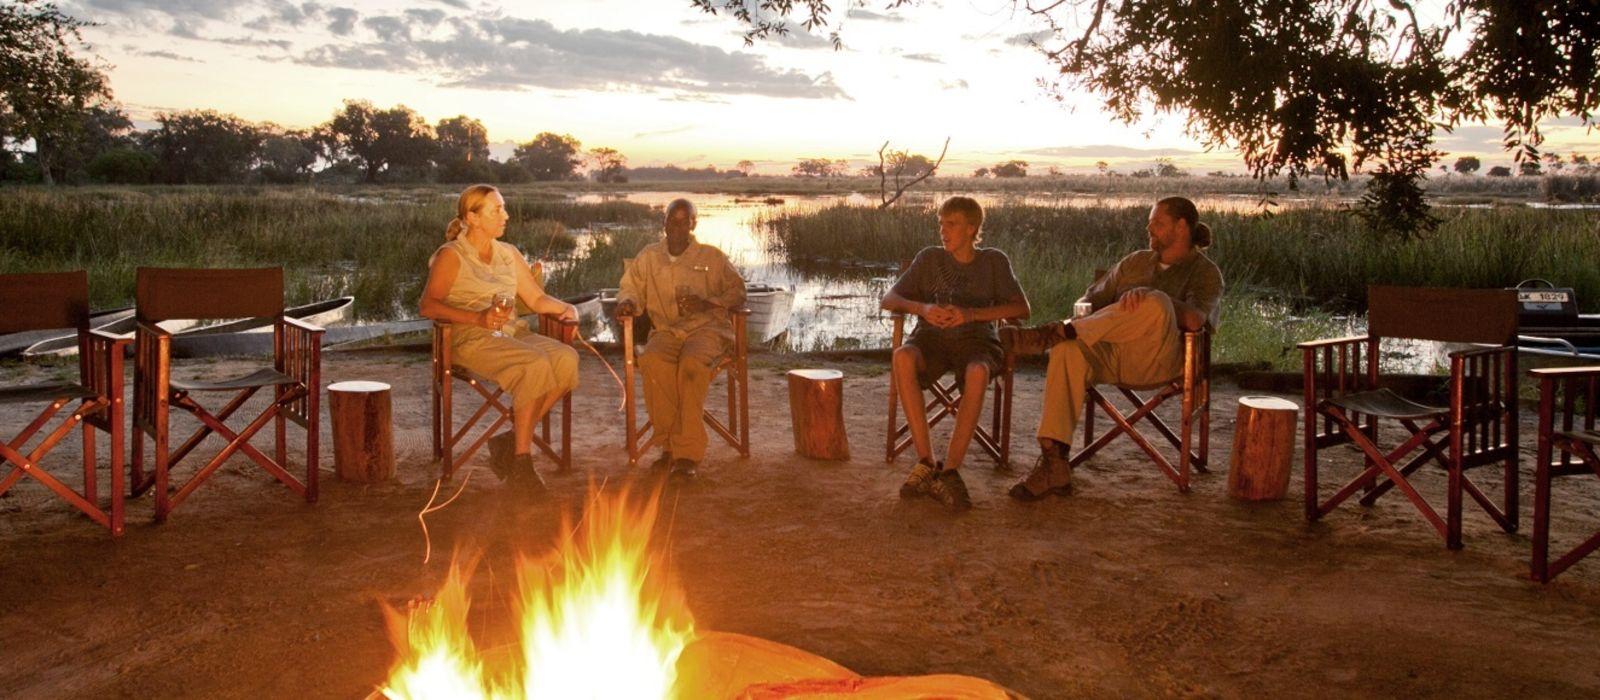 Botswana: Your Wildest Dreams Tour Trip 7